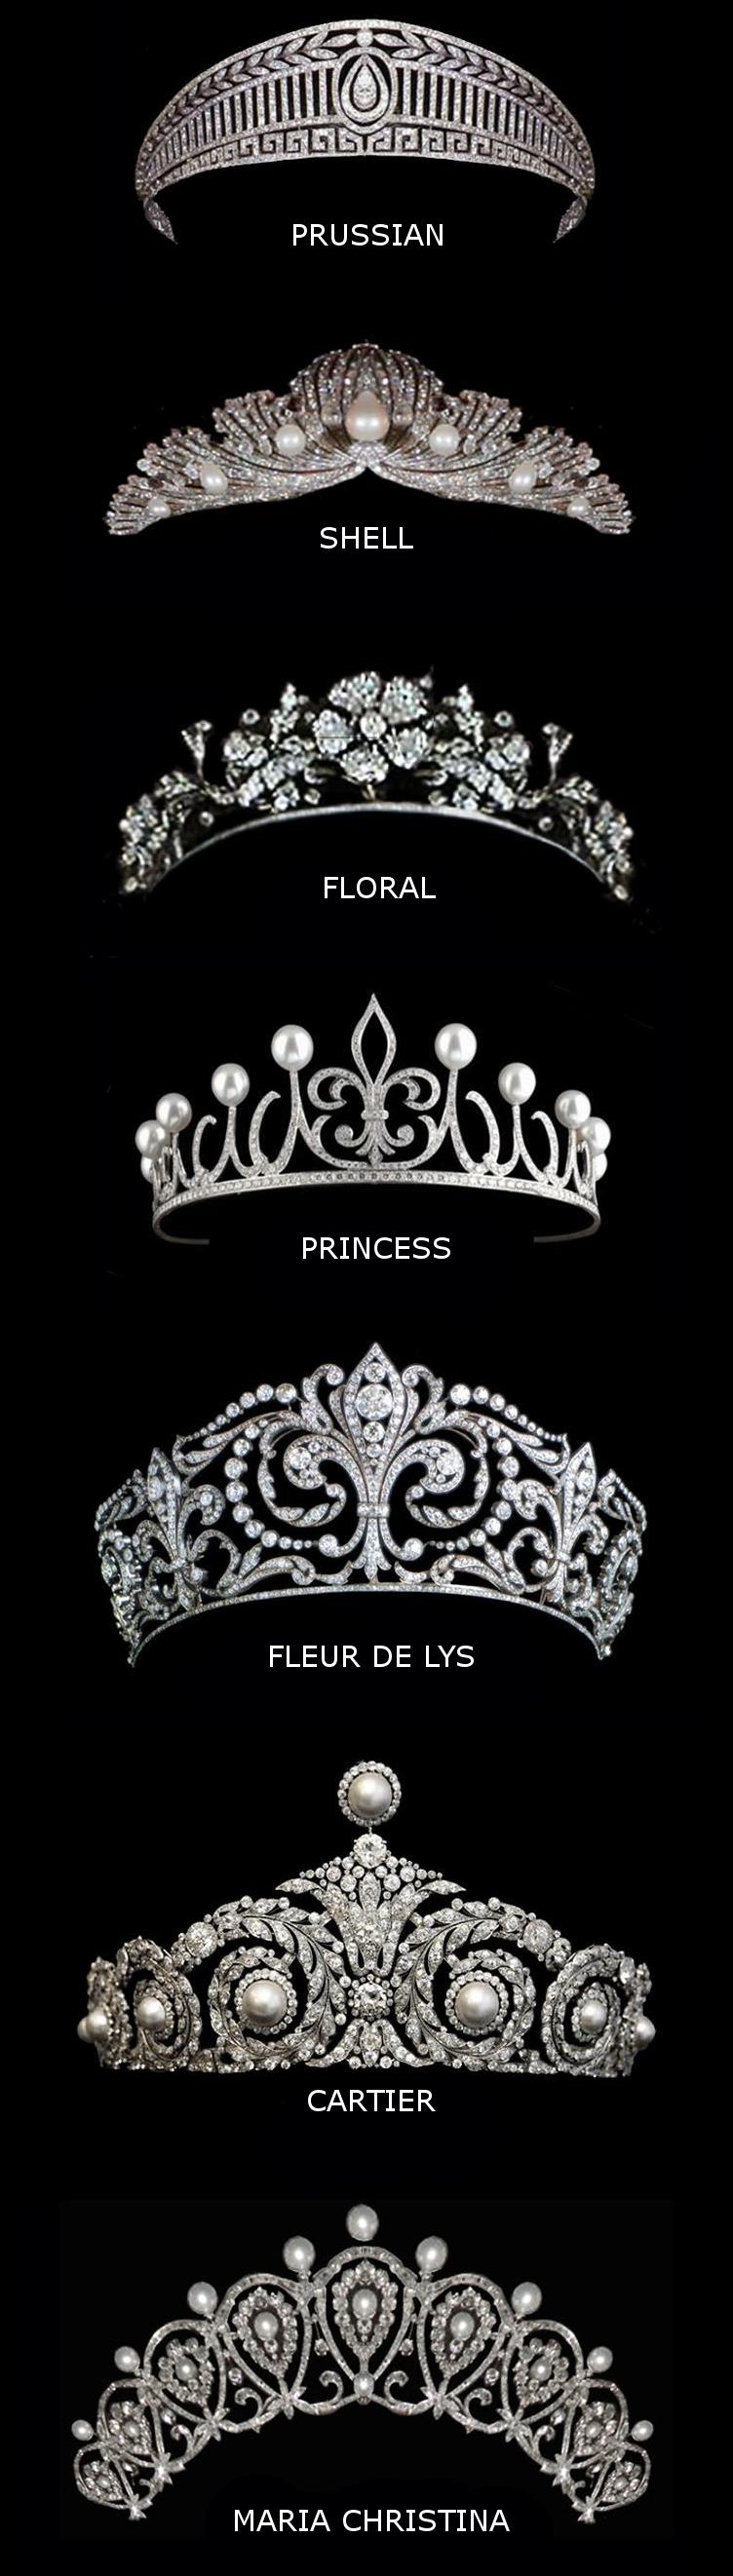 Spanish royal tiaras